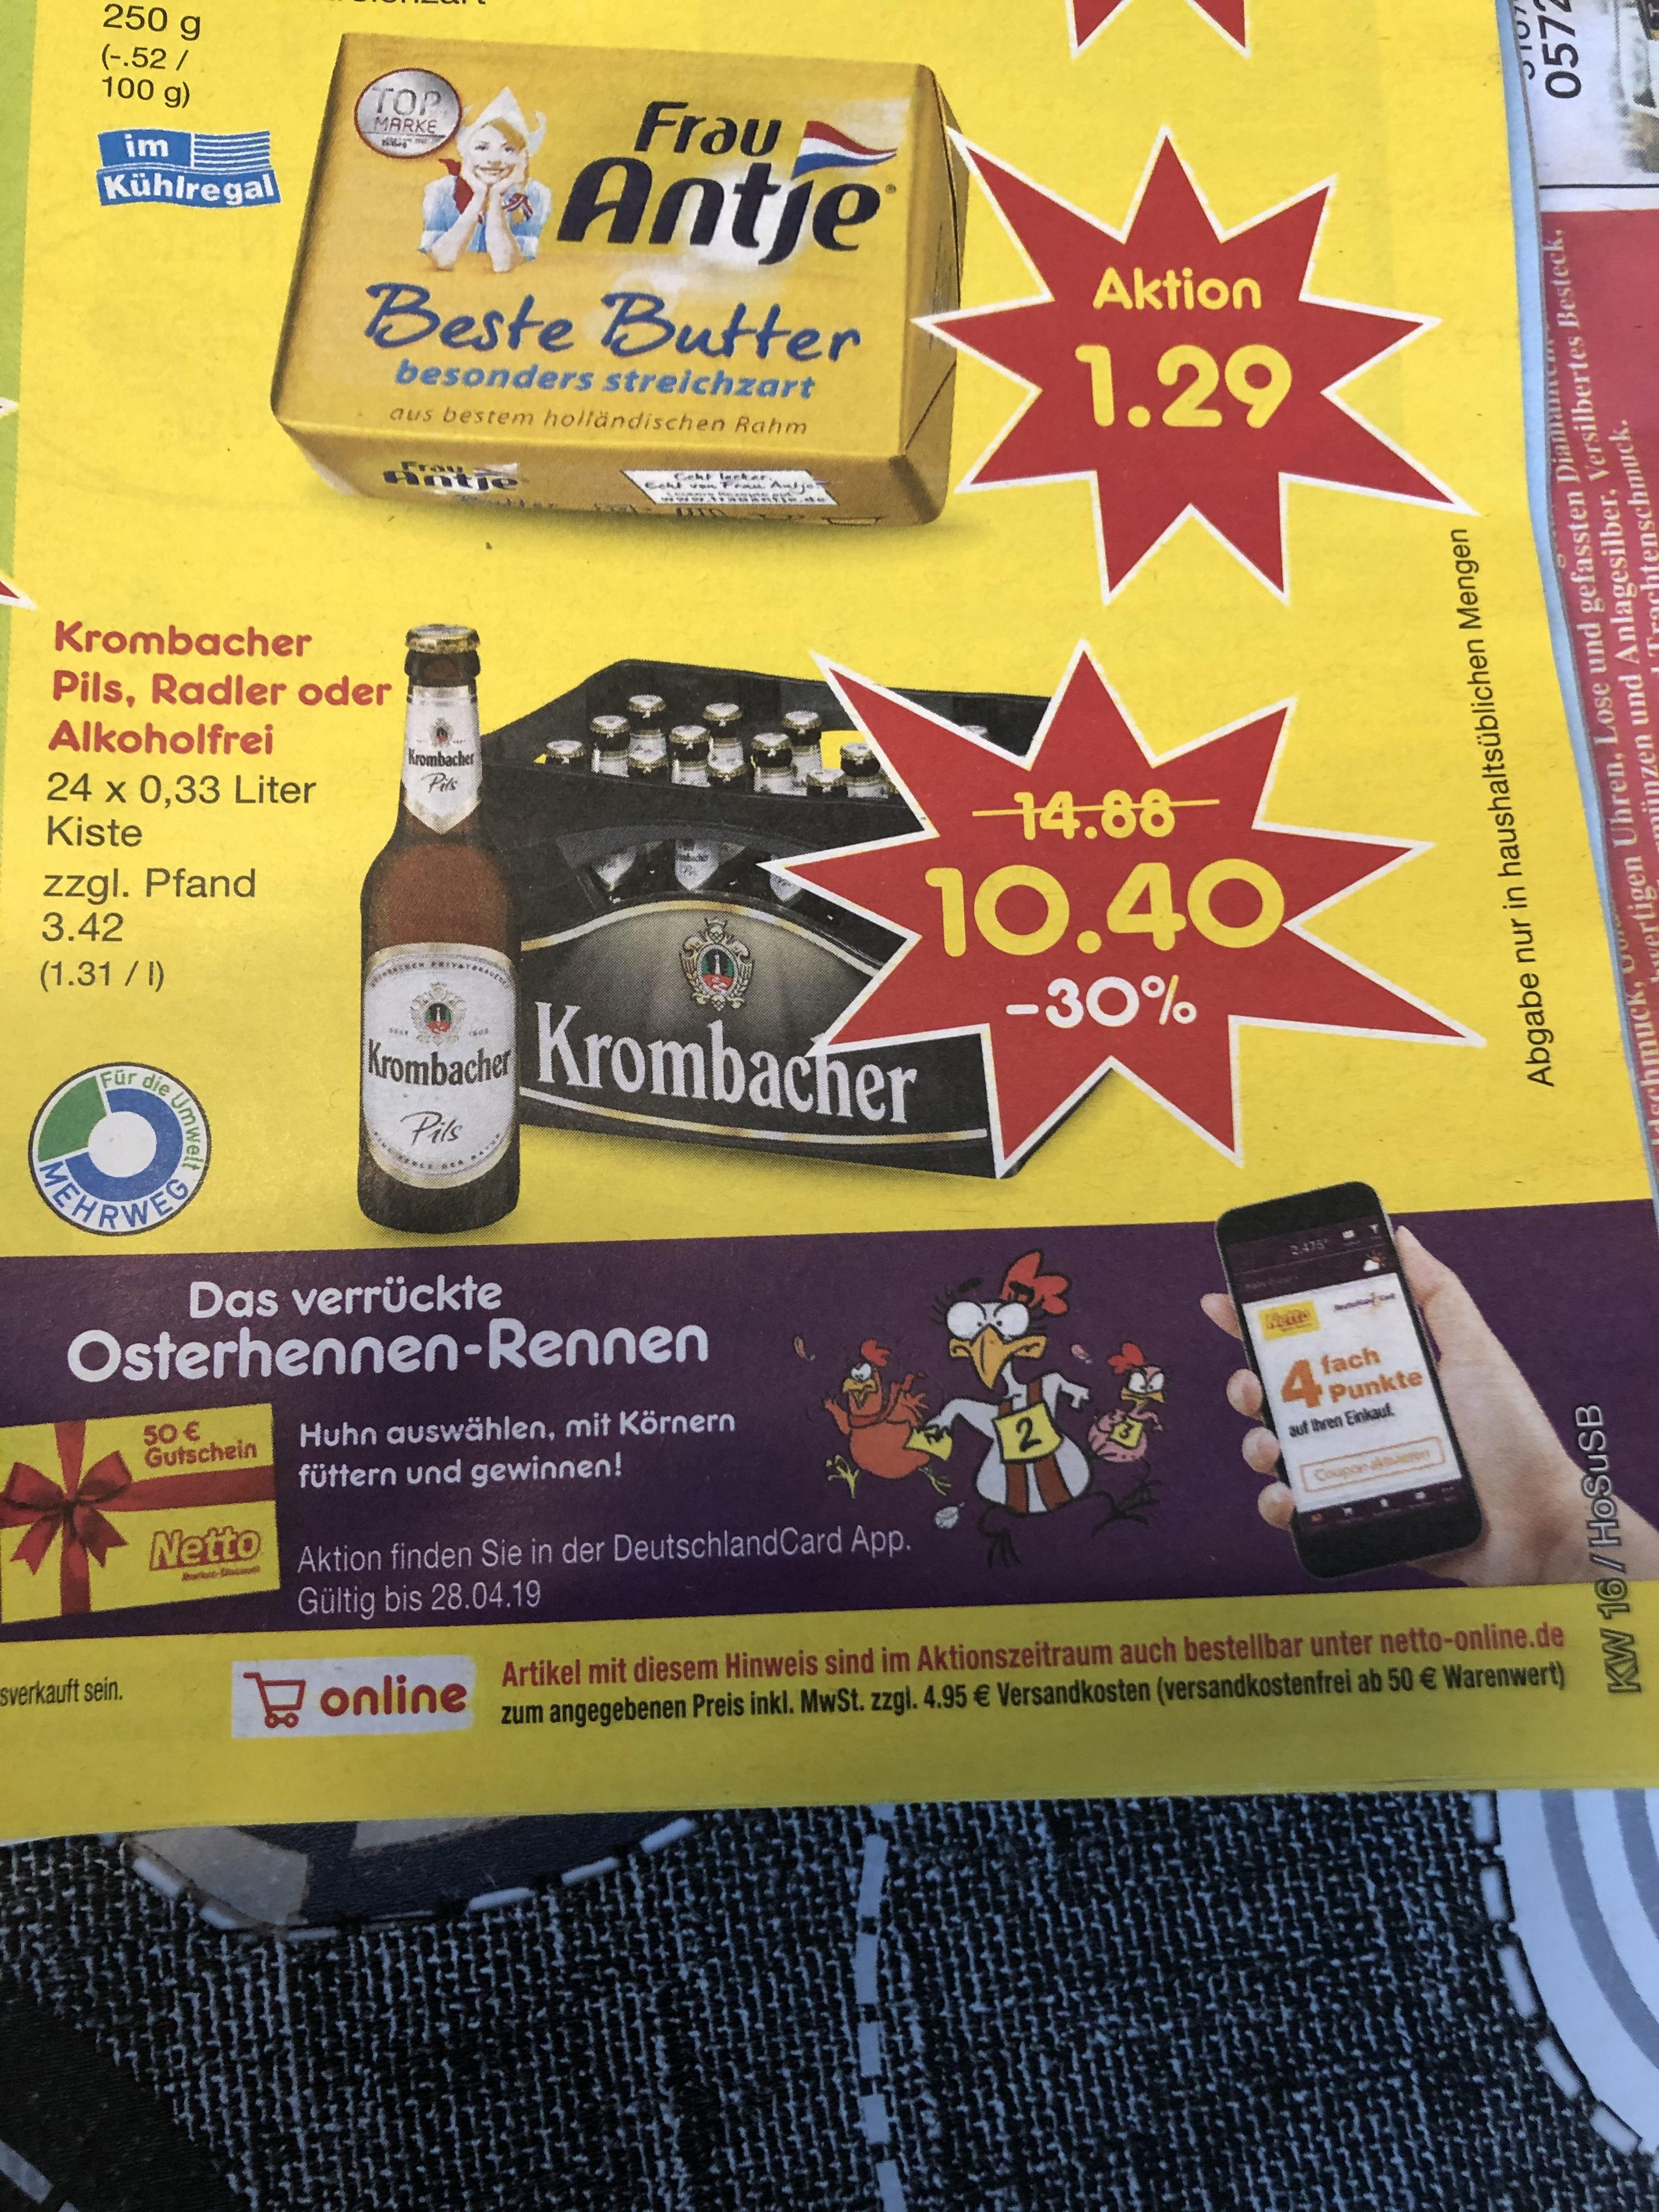 Krombacher Pils 24x0.33